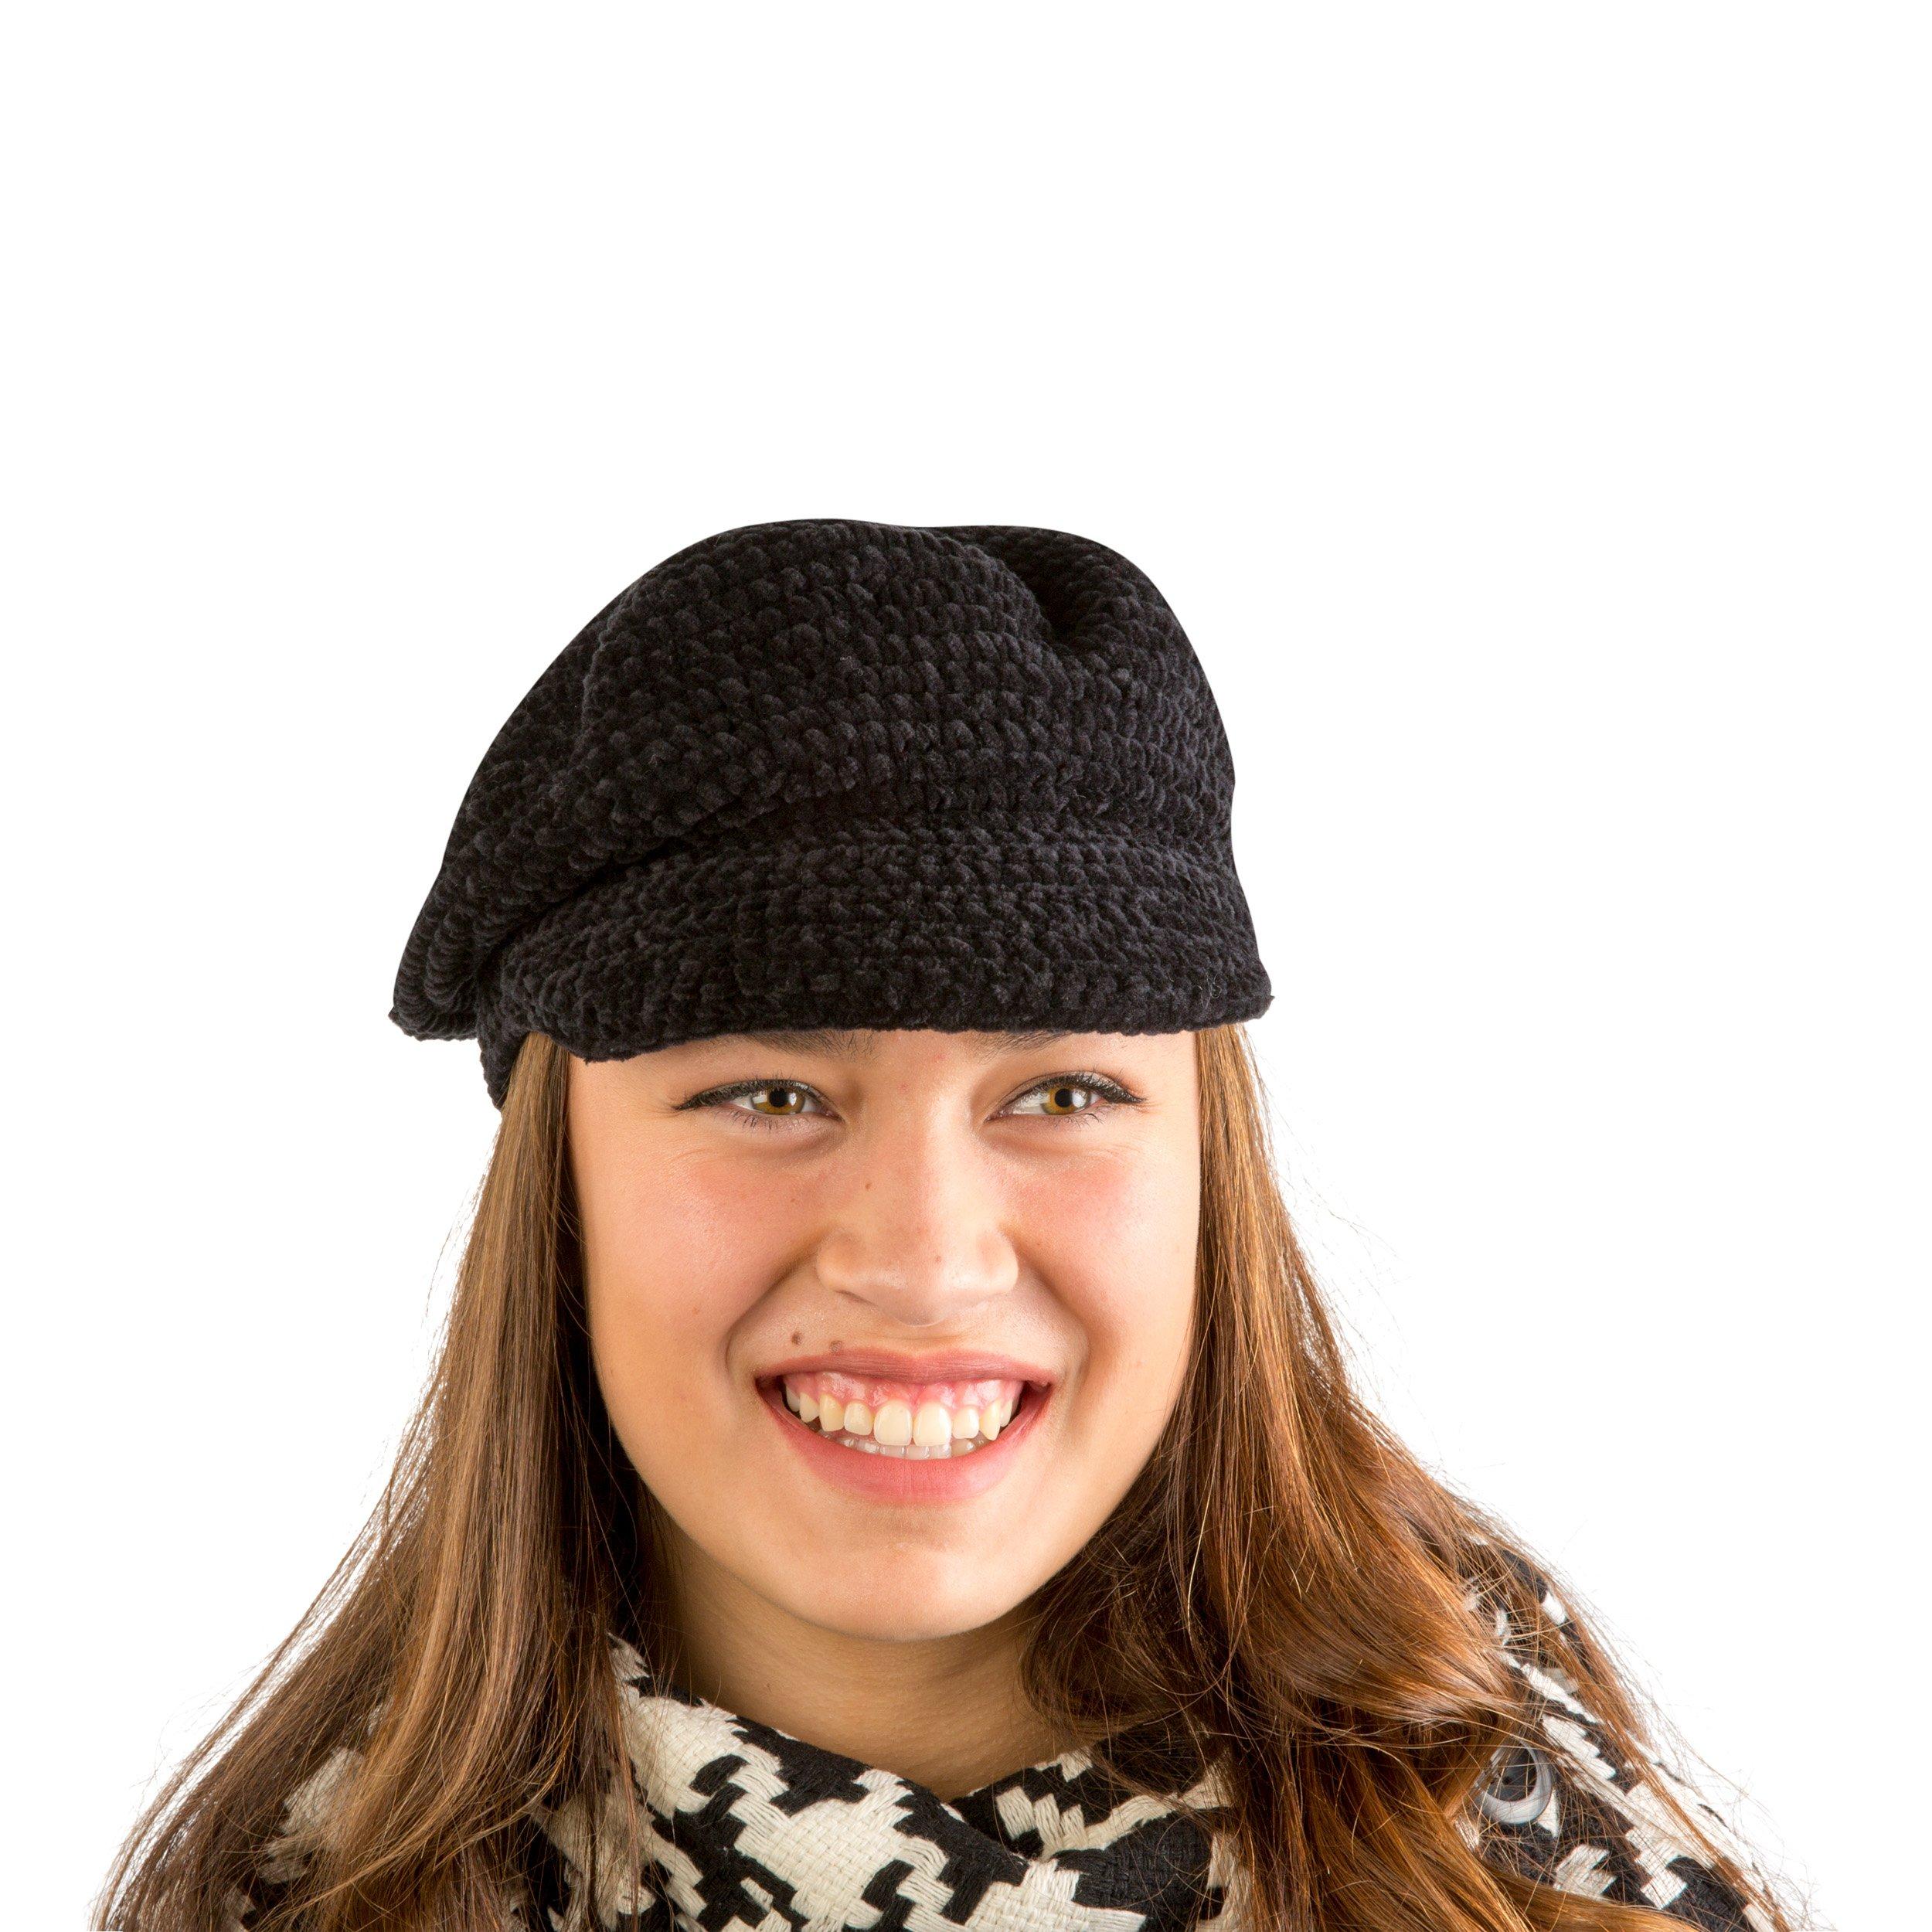 AUGUST HAT COMPANY Women's Black Chenille Lightweight Multi-Season Modcap Hat